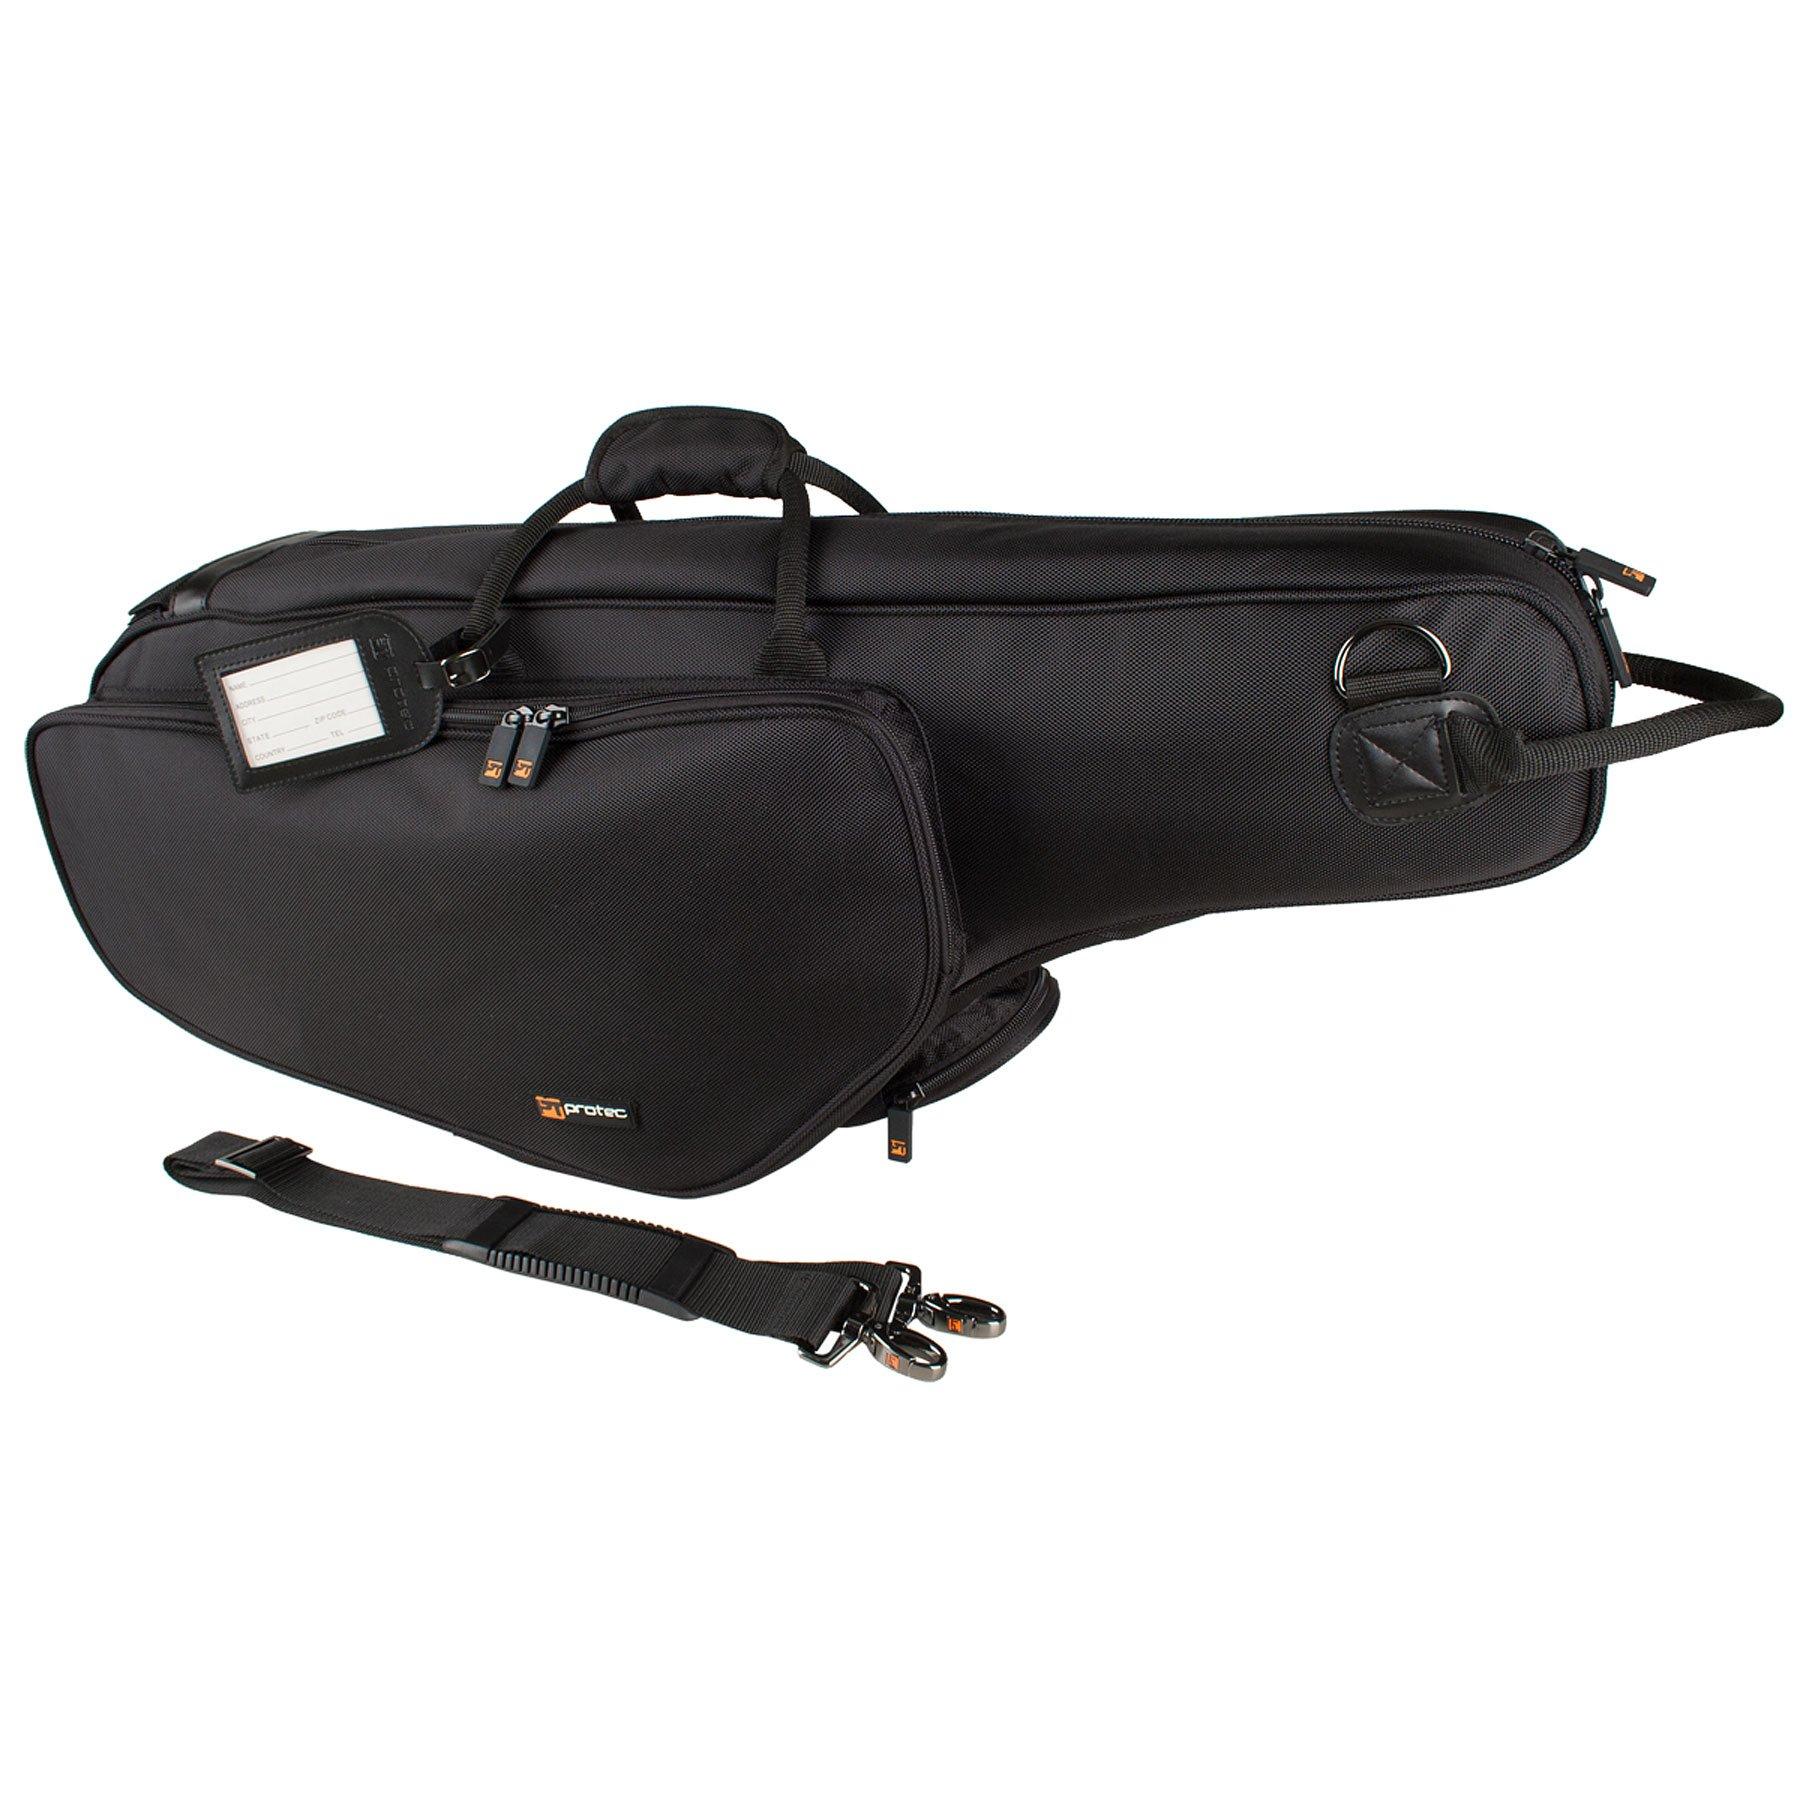 Protec Tenor Saxophone Padded Gig Bag - Gold Series, Model C236